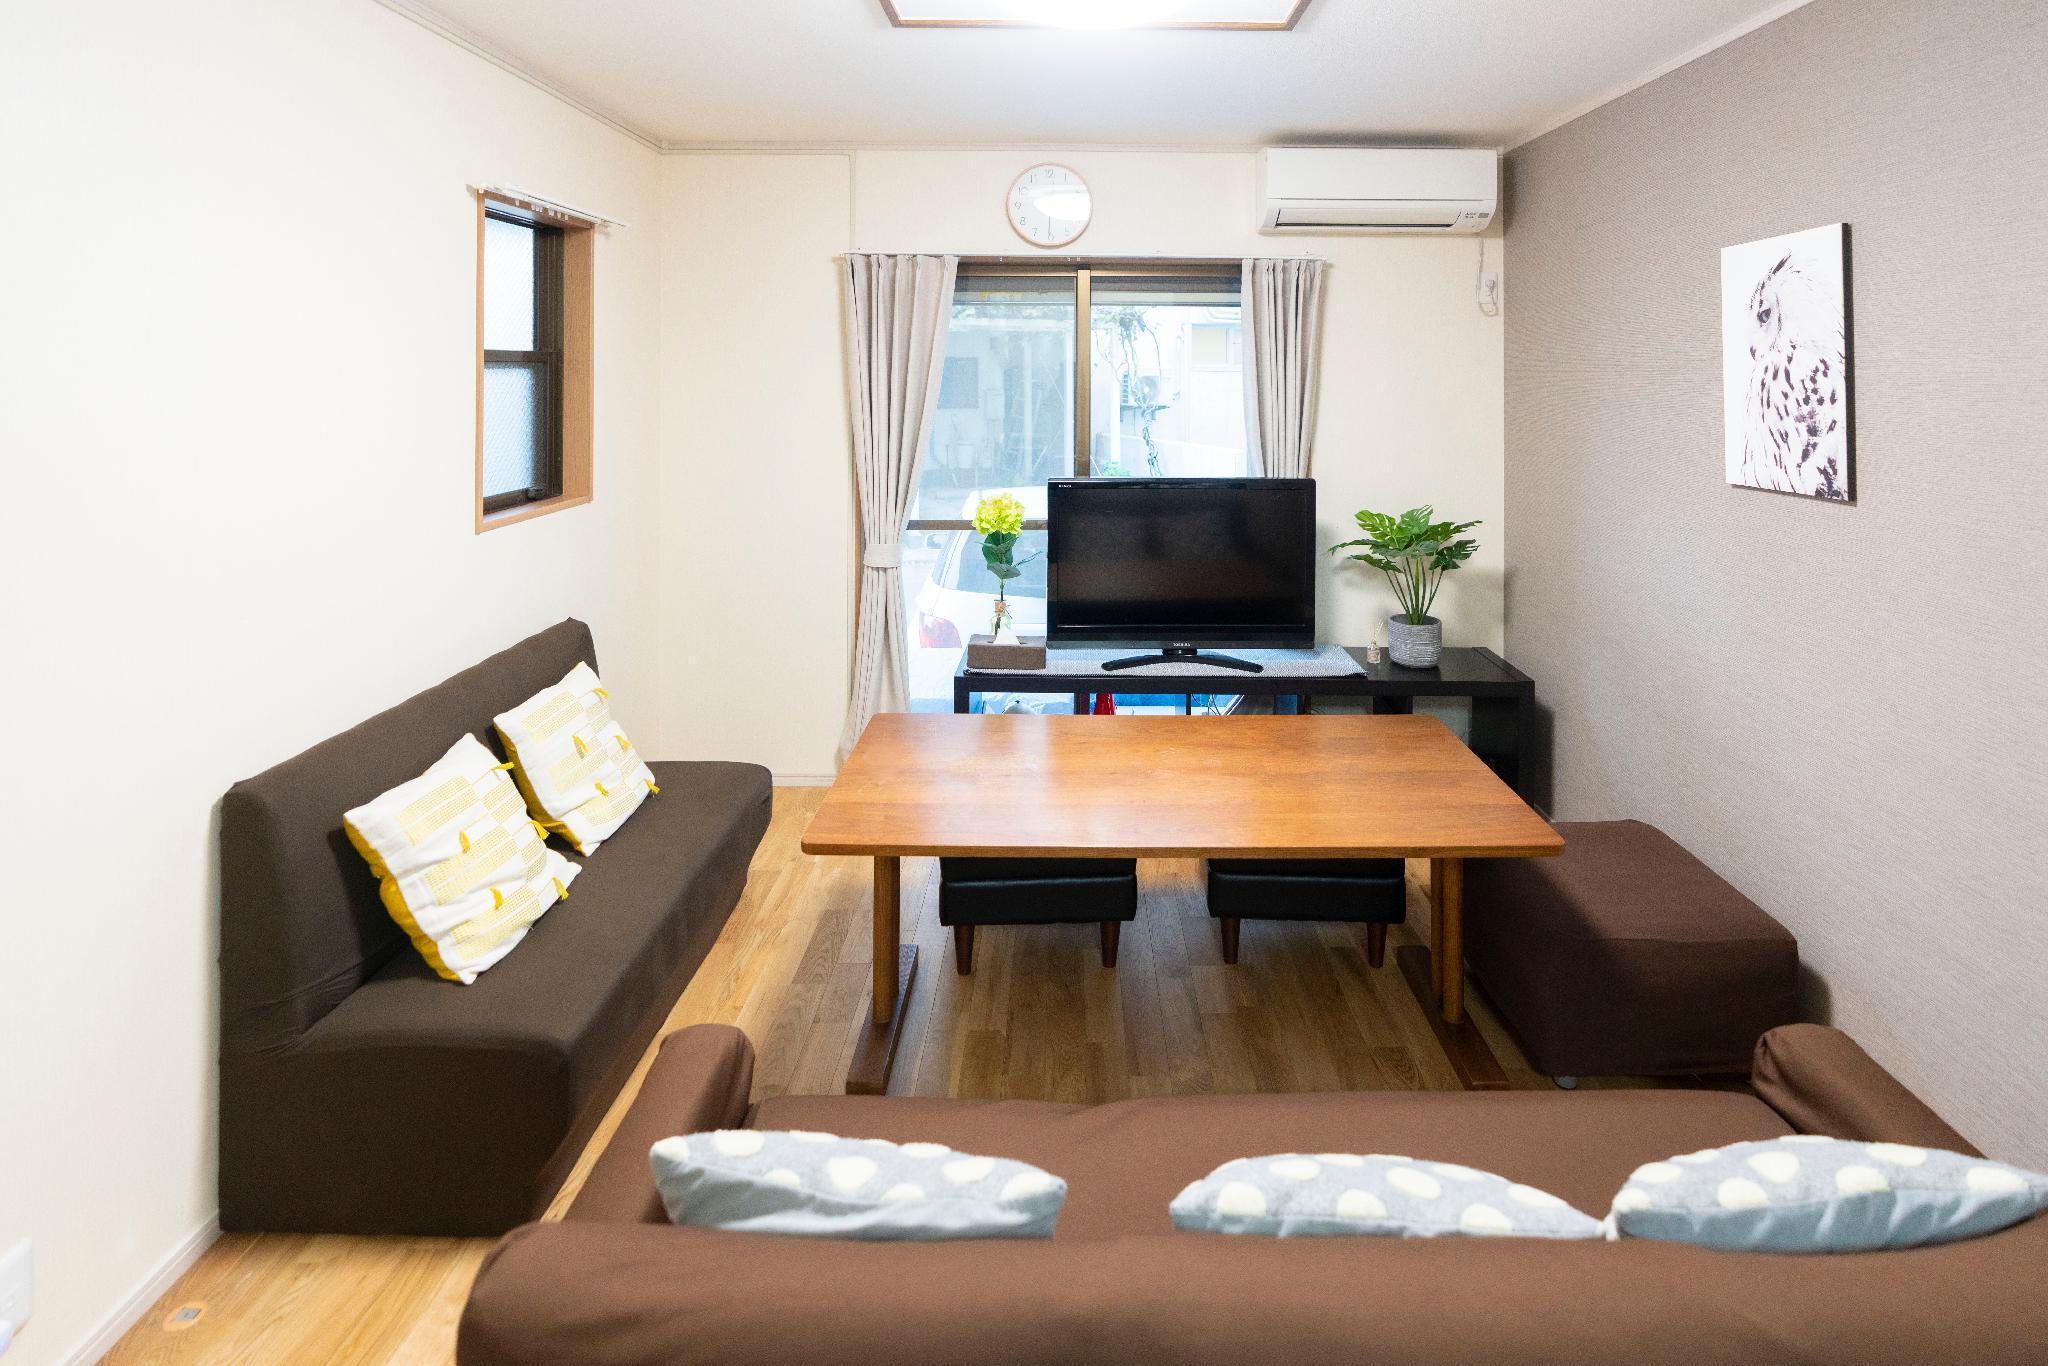 New Open Nagoya Sakae 4LDK 12 People Can Stay